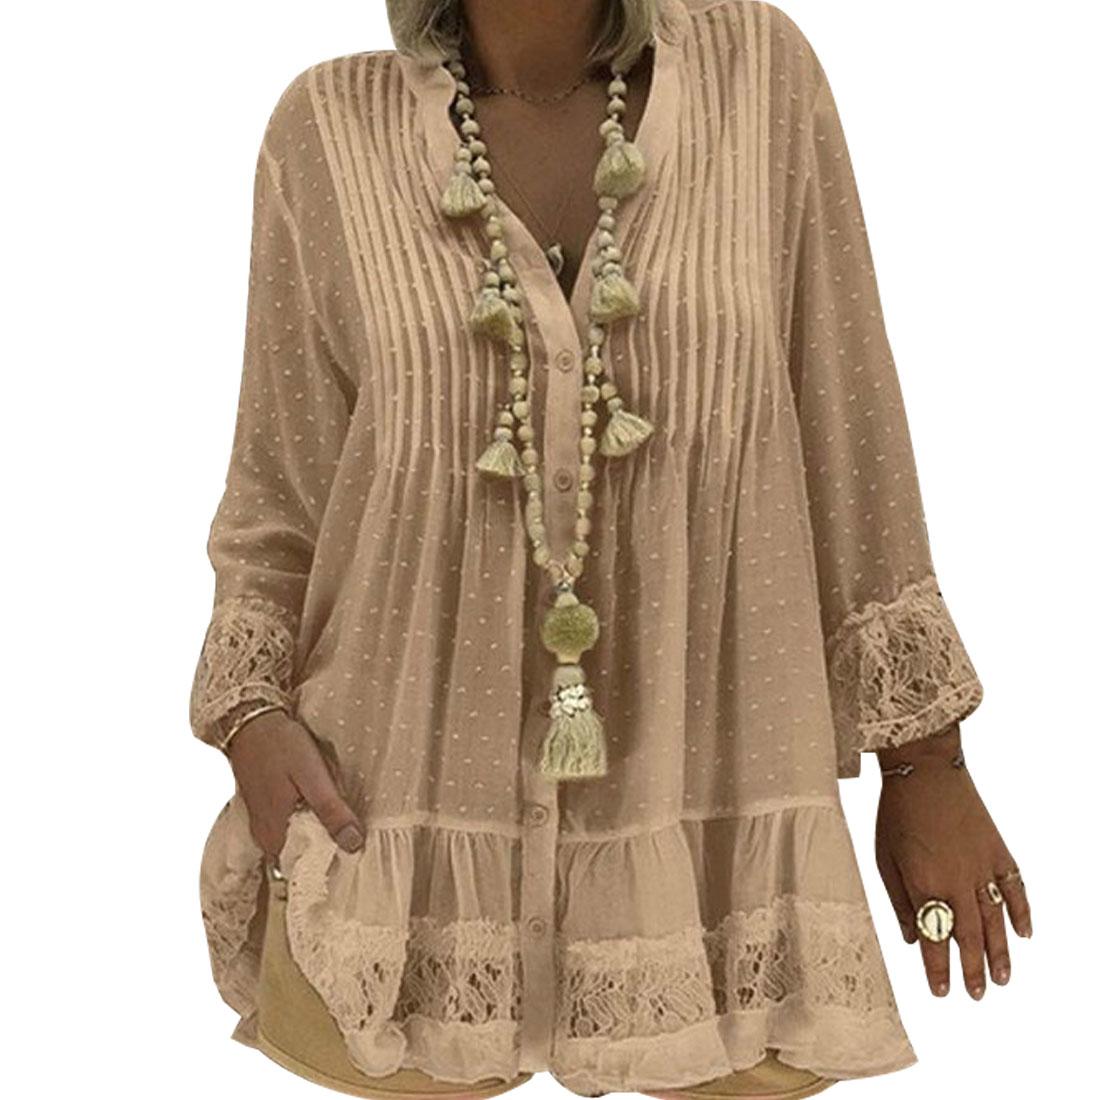 2020 Large Size 4xl 5xl Summer Clothing Lace Shirts Loose Chiffon Dress Loose blouse shirt Sleeve V Neck Shirt Female BlousesBlouses & Shirts   -